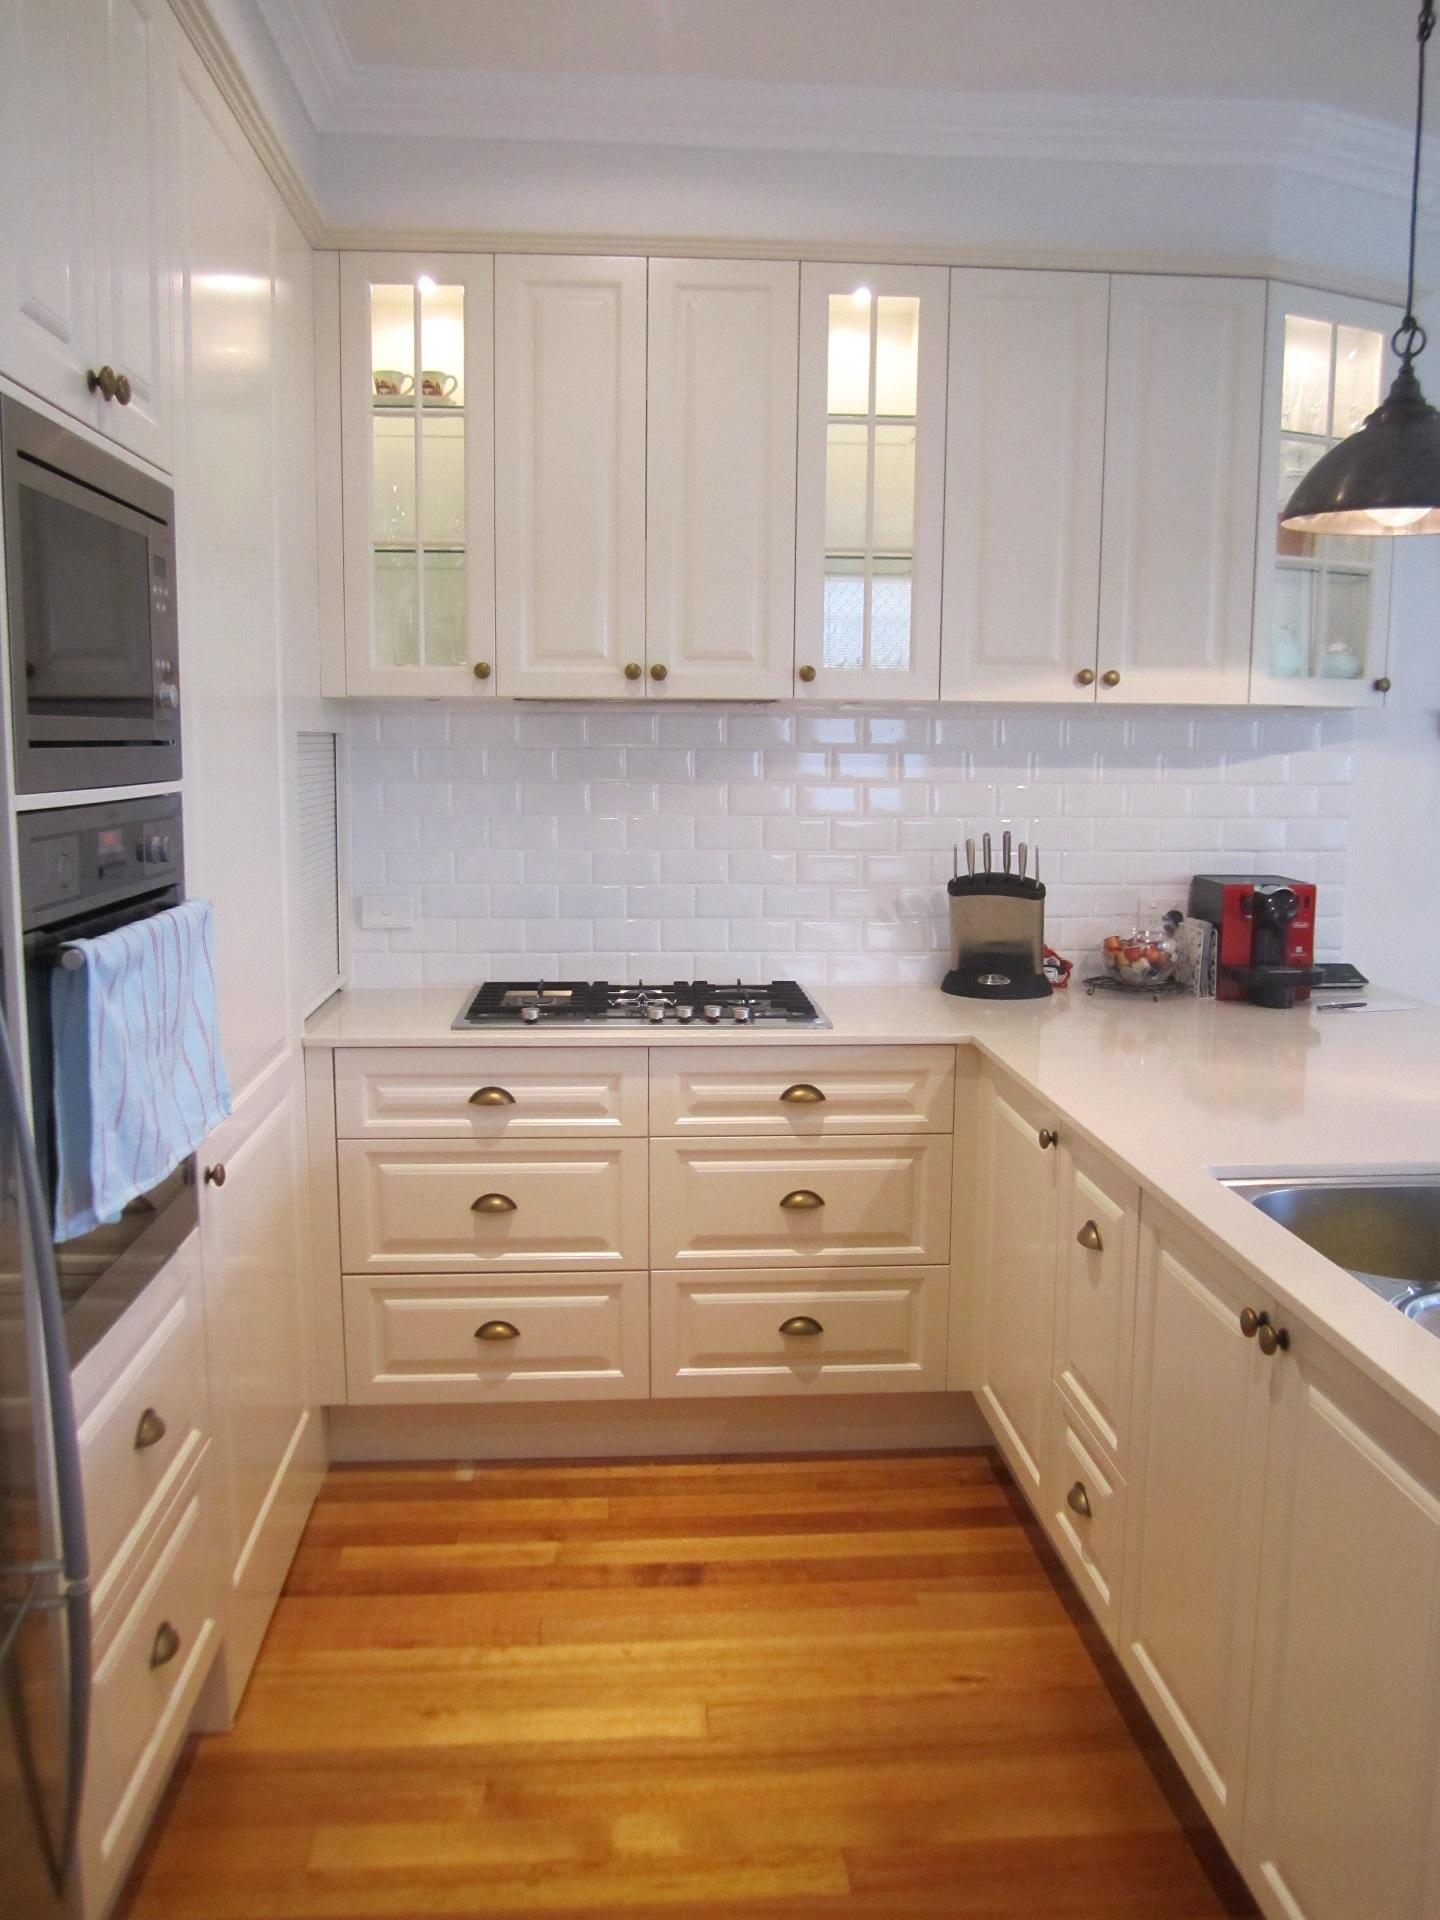 Brisbane Kitchen Design Sydney St Camp Hill  Traditional Kitchen Renovation (4)